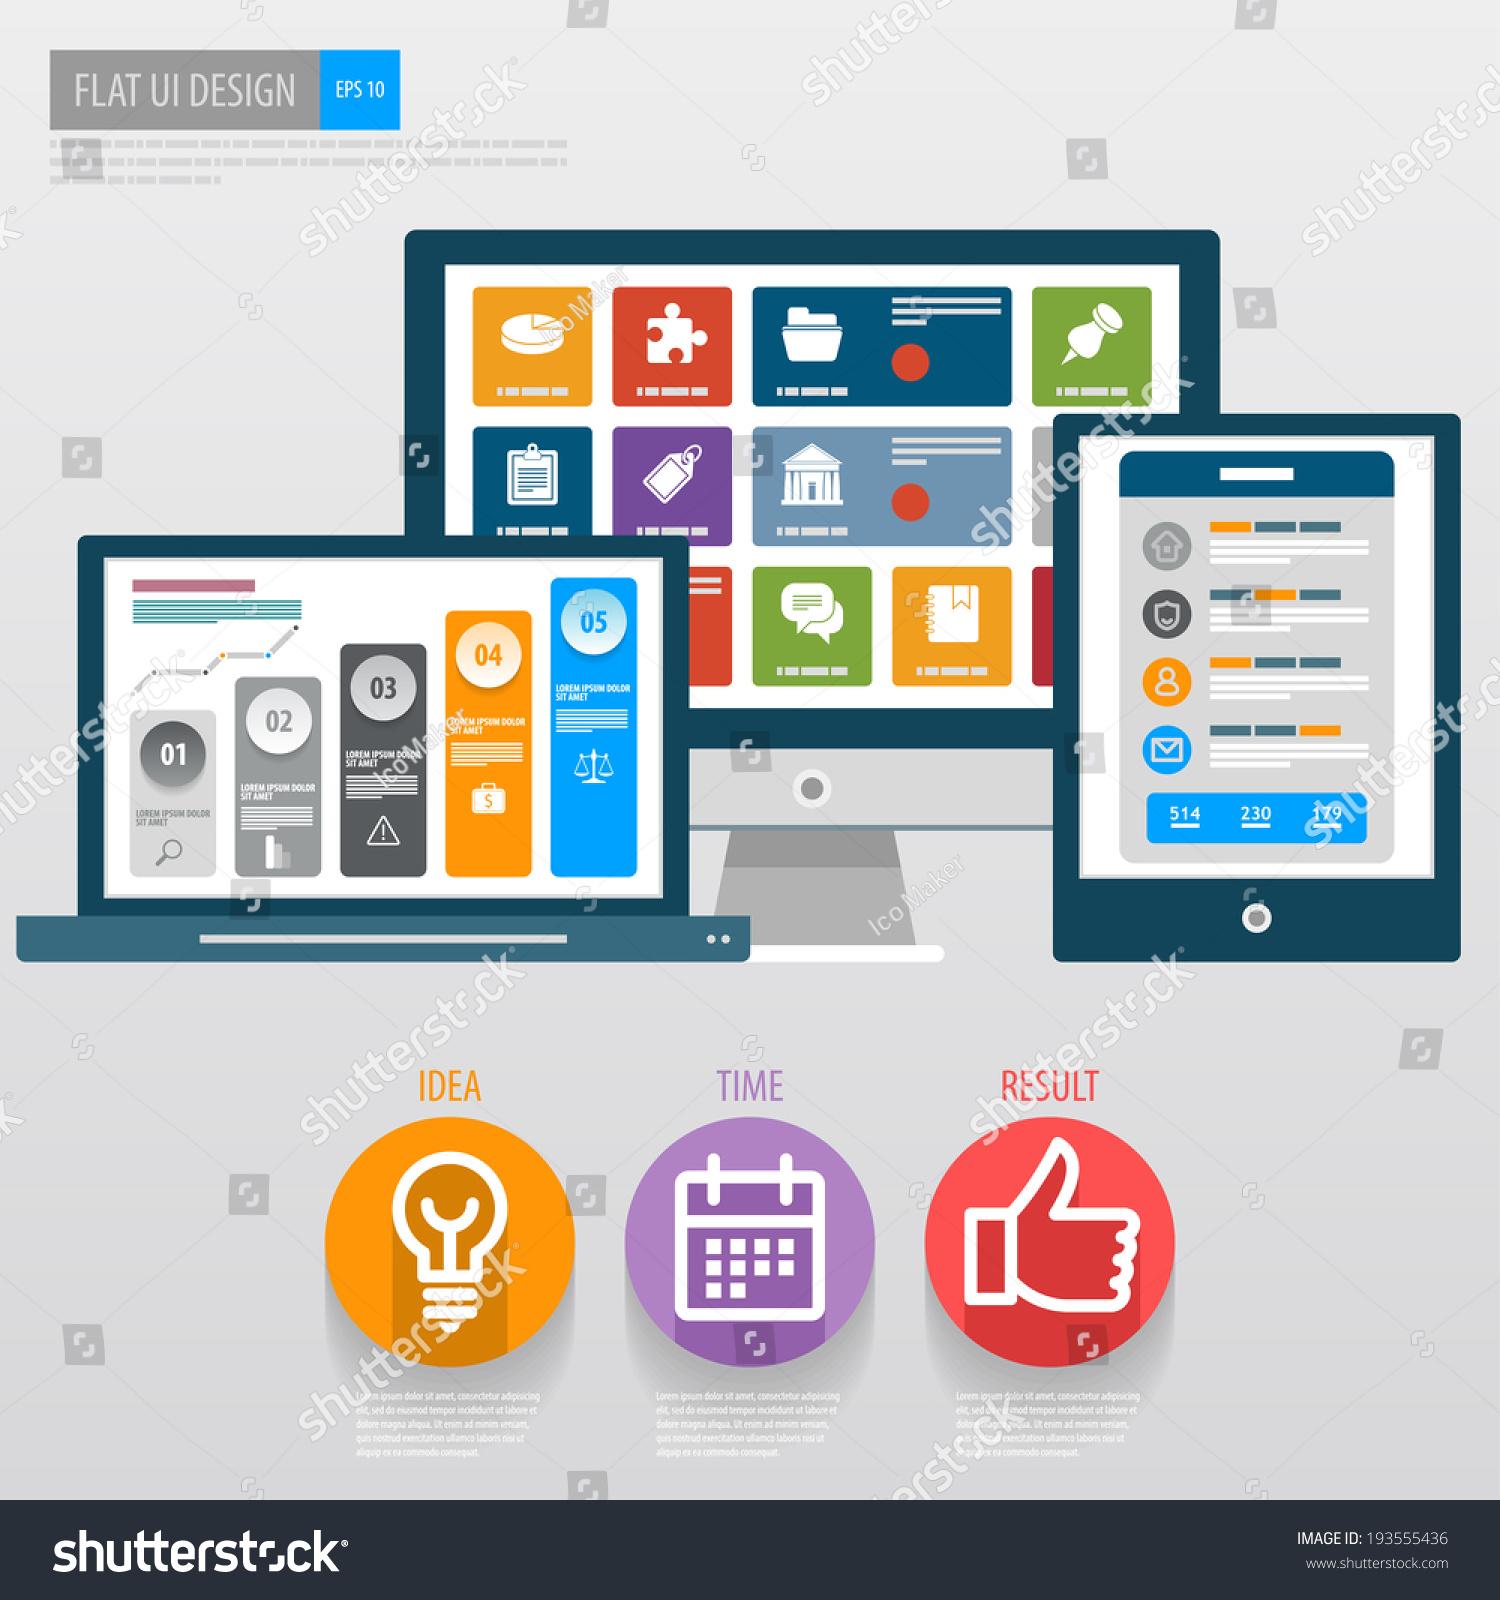 flat ui design responsive web template icons for web design seo social media vector eps 10. Black Bedroom Furniture Sets. Home Design Ideas